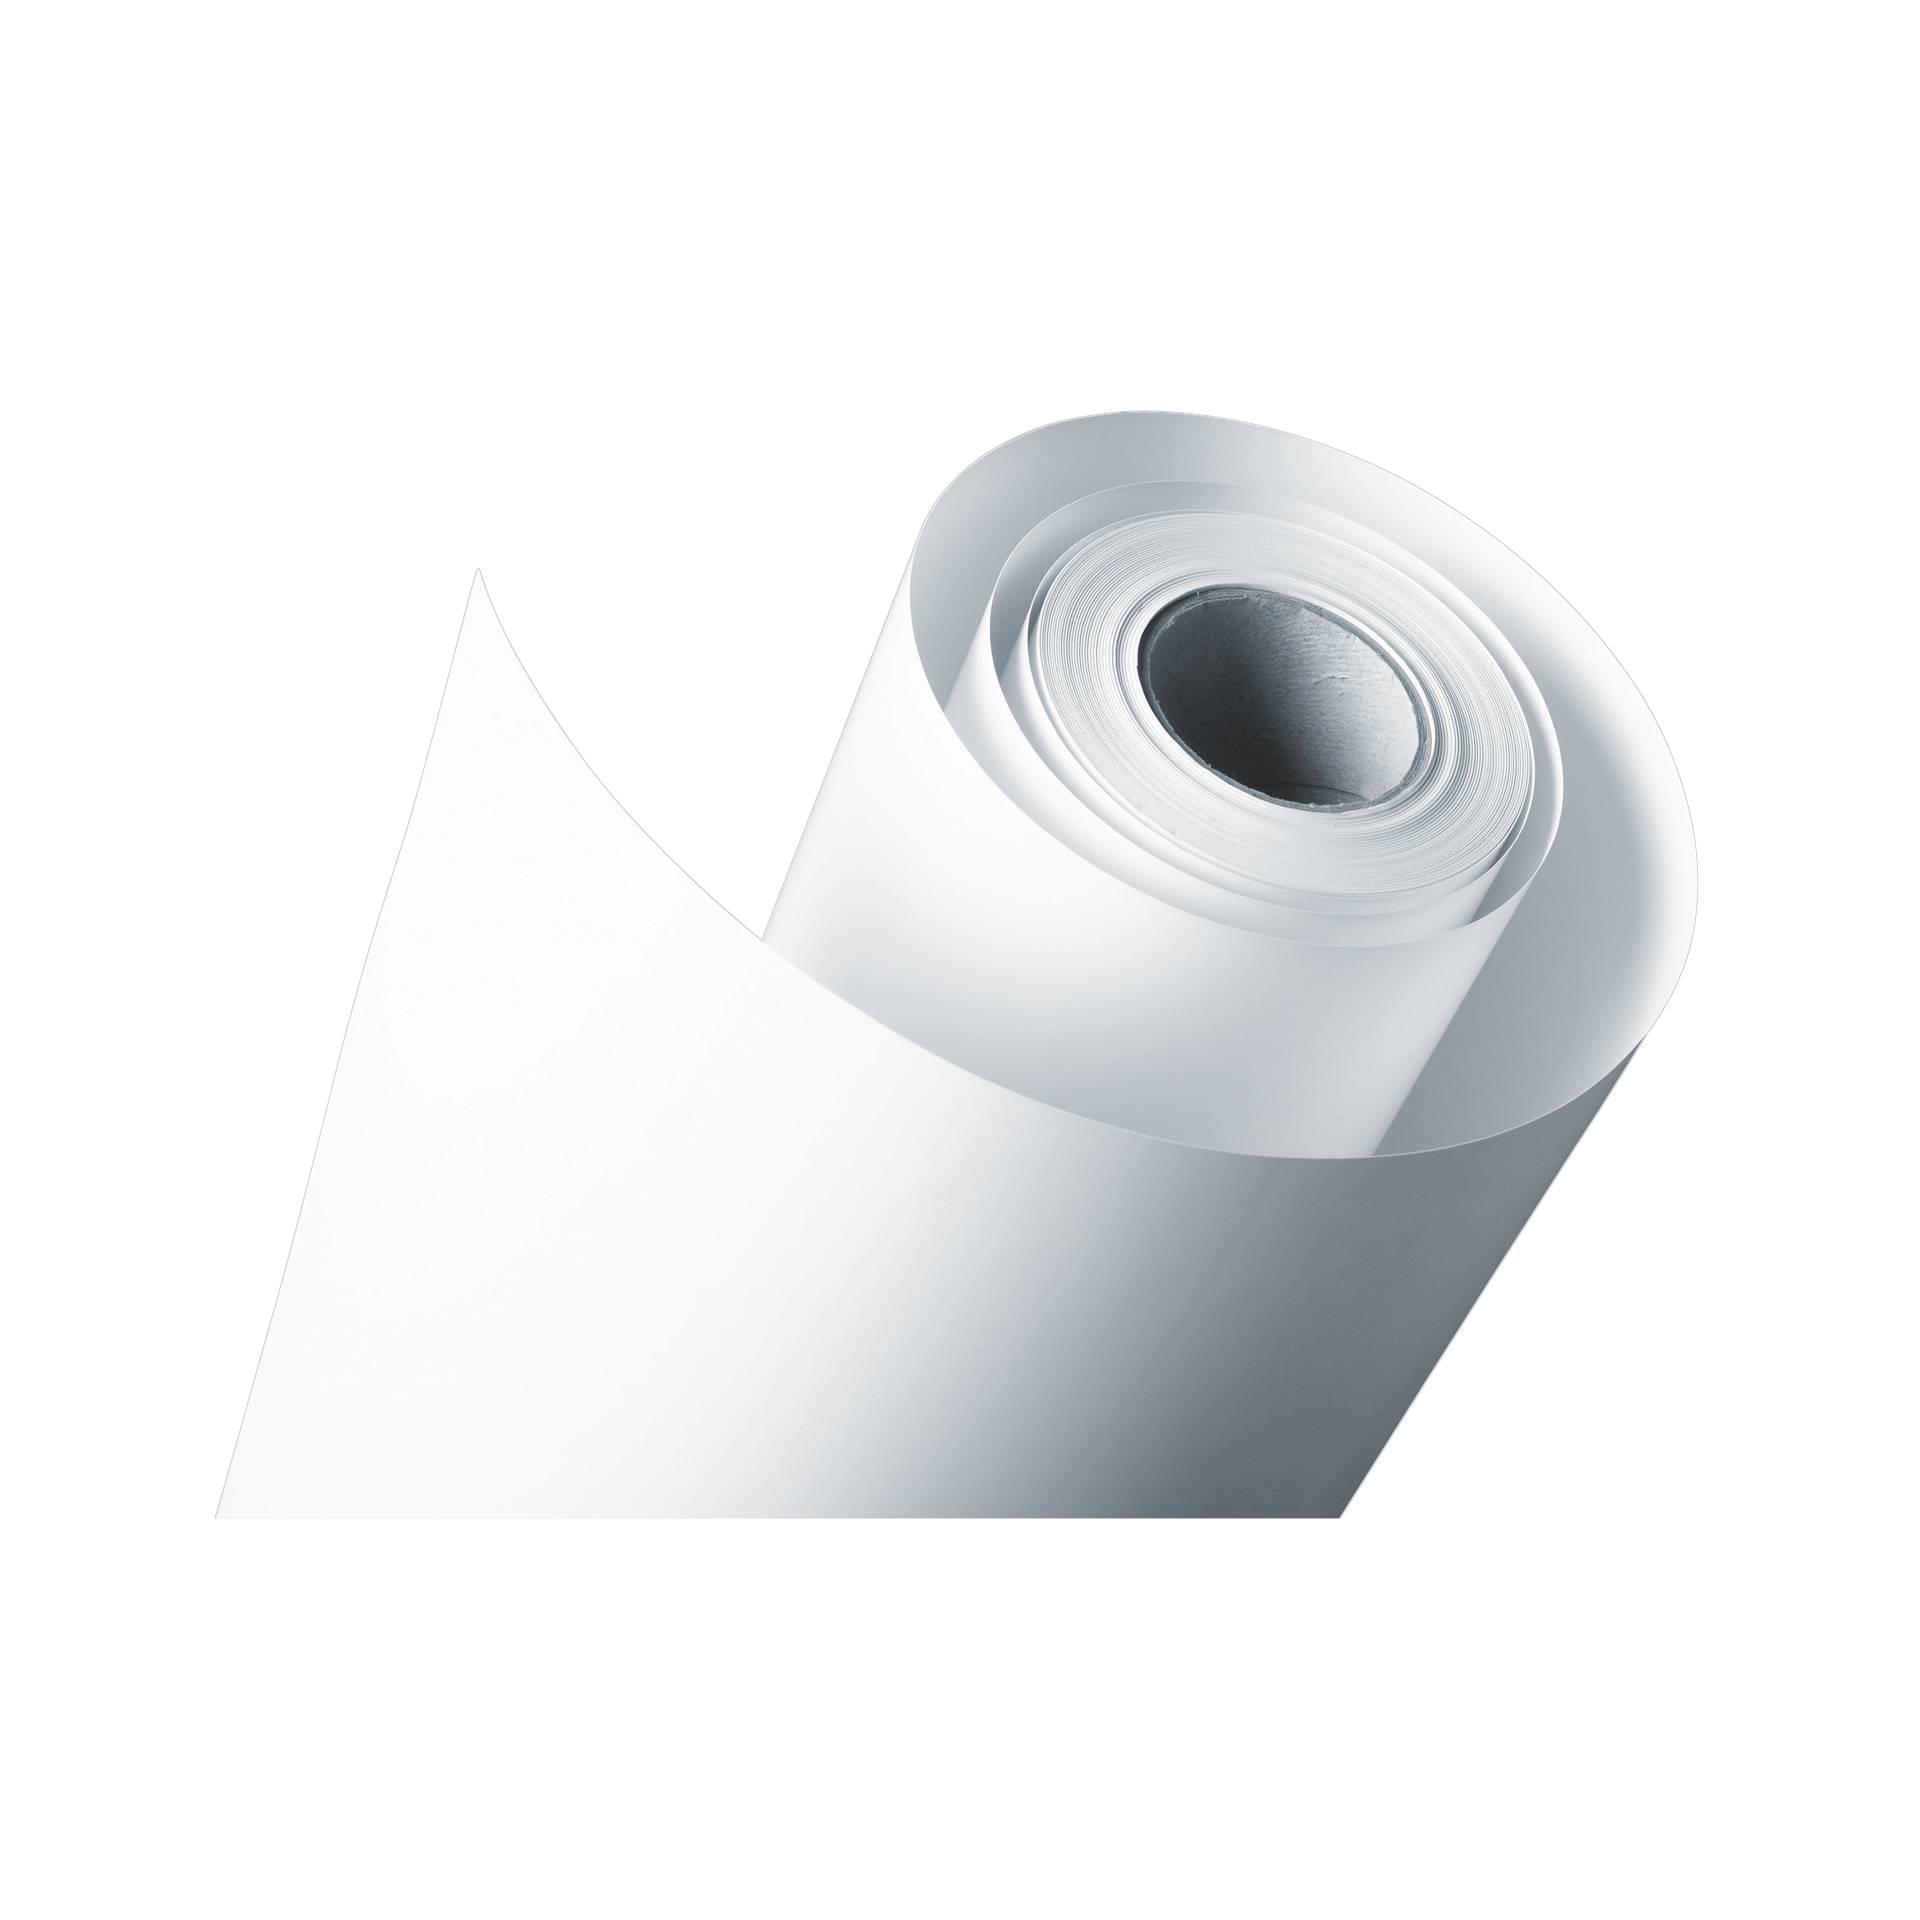 1x2 Fujifilm DL Paper 230 g 127 mm x 65 m lustre